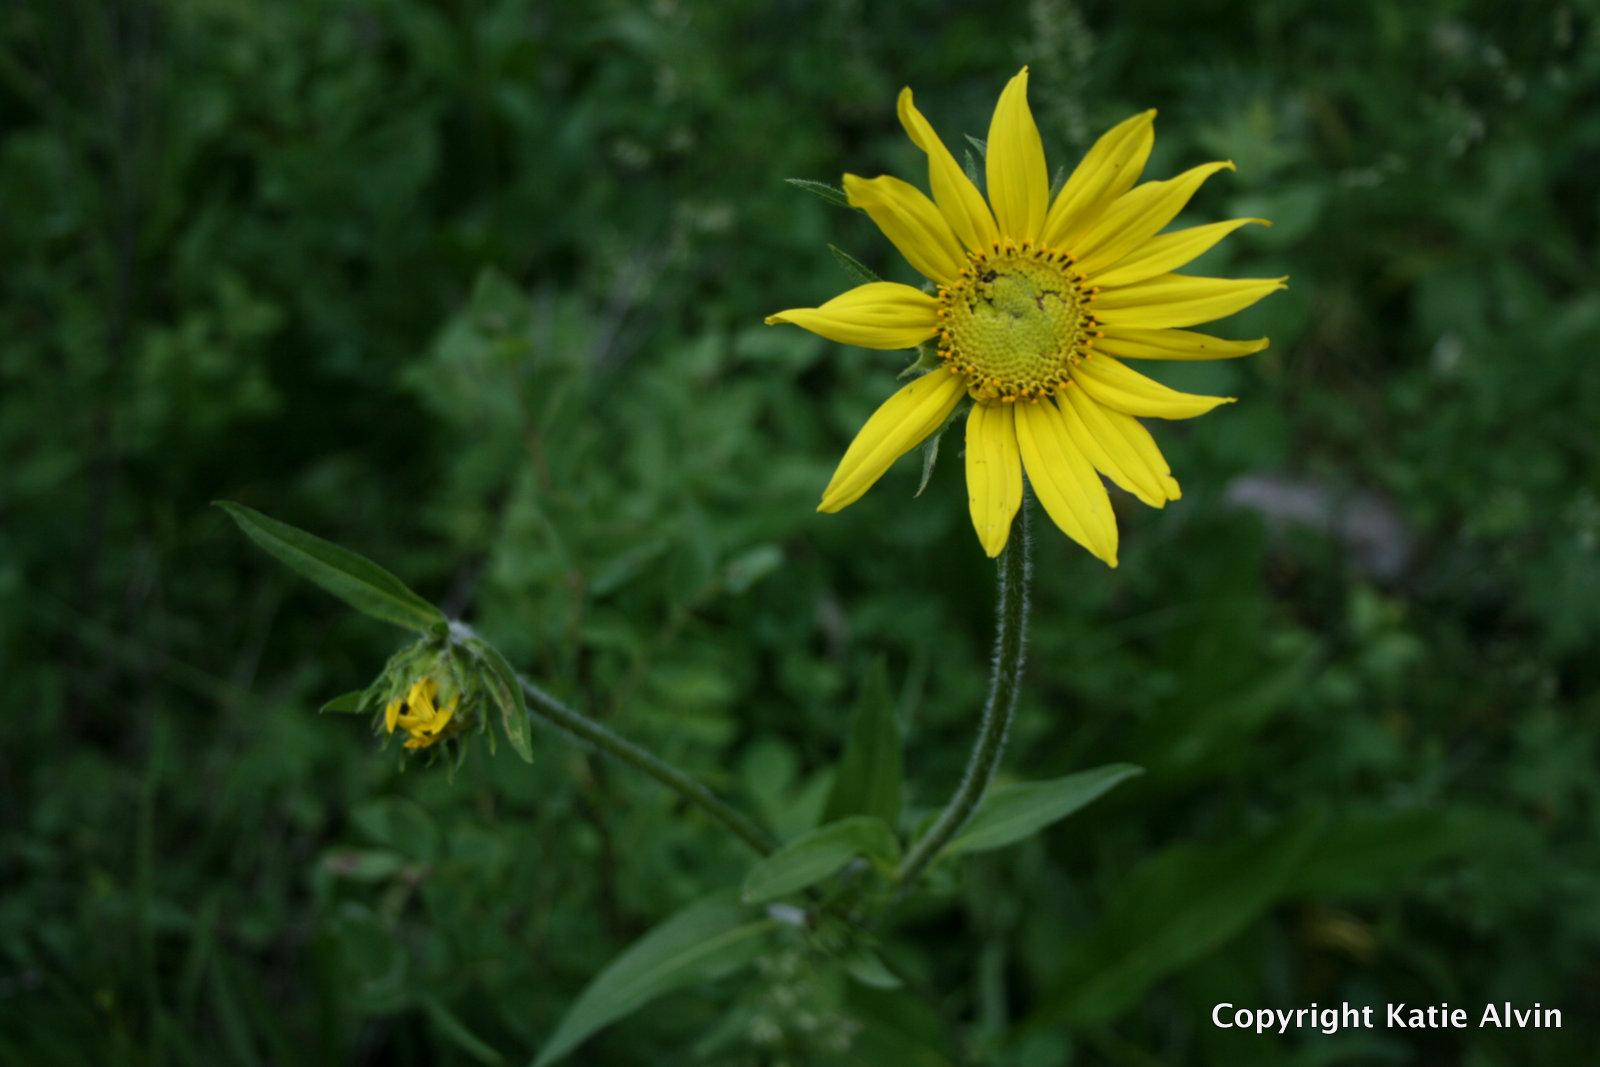 Helianthella or False Sunflower